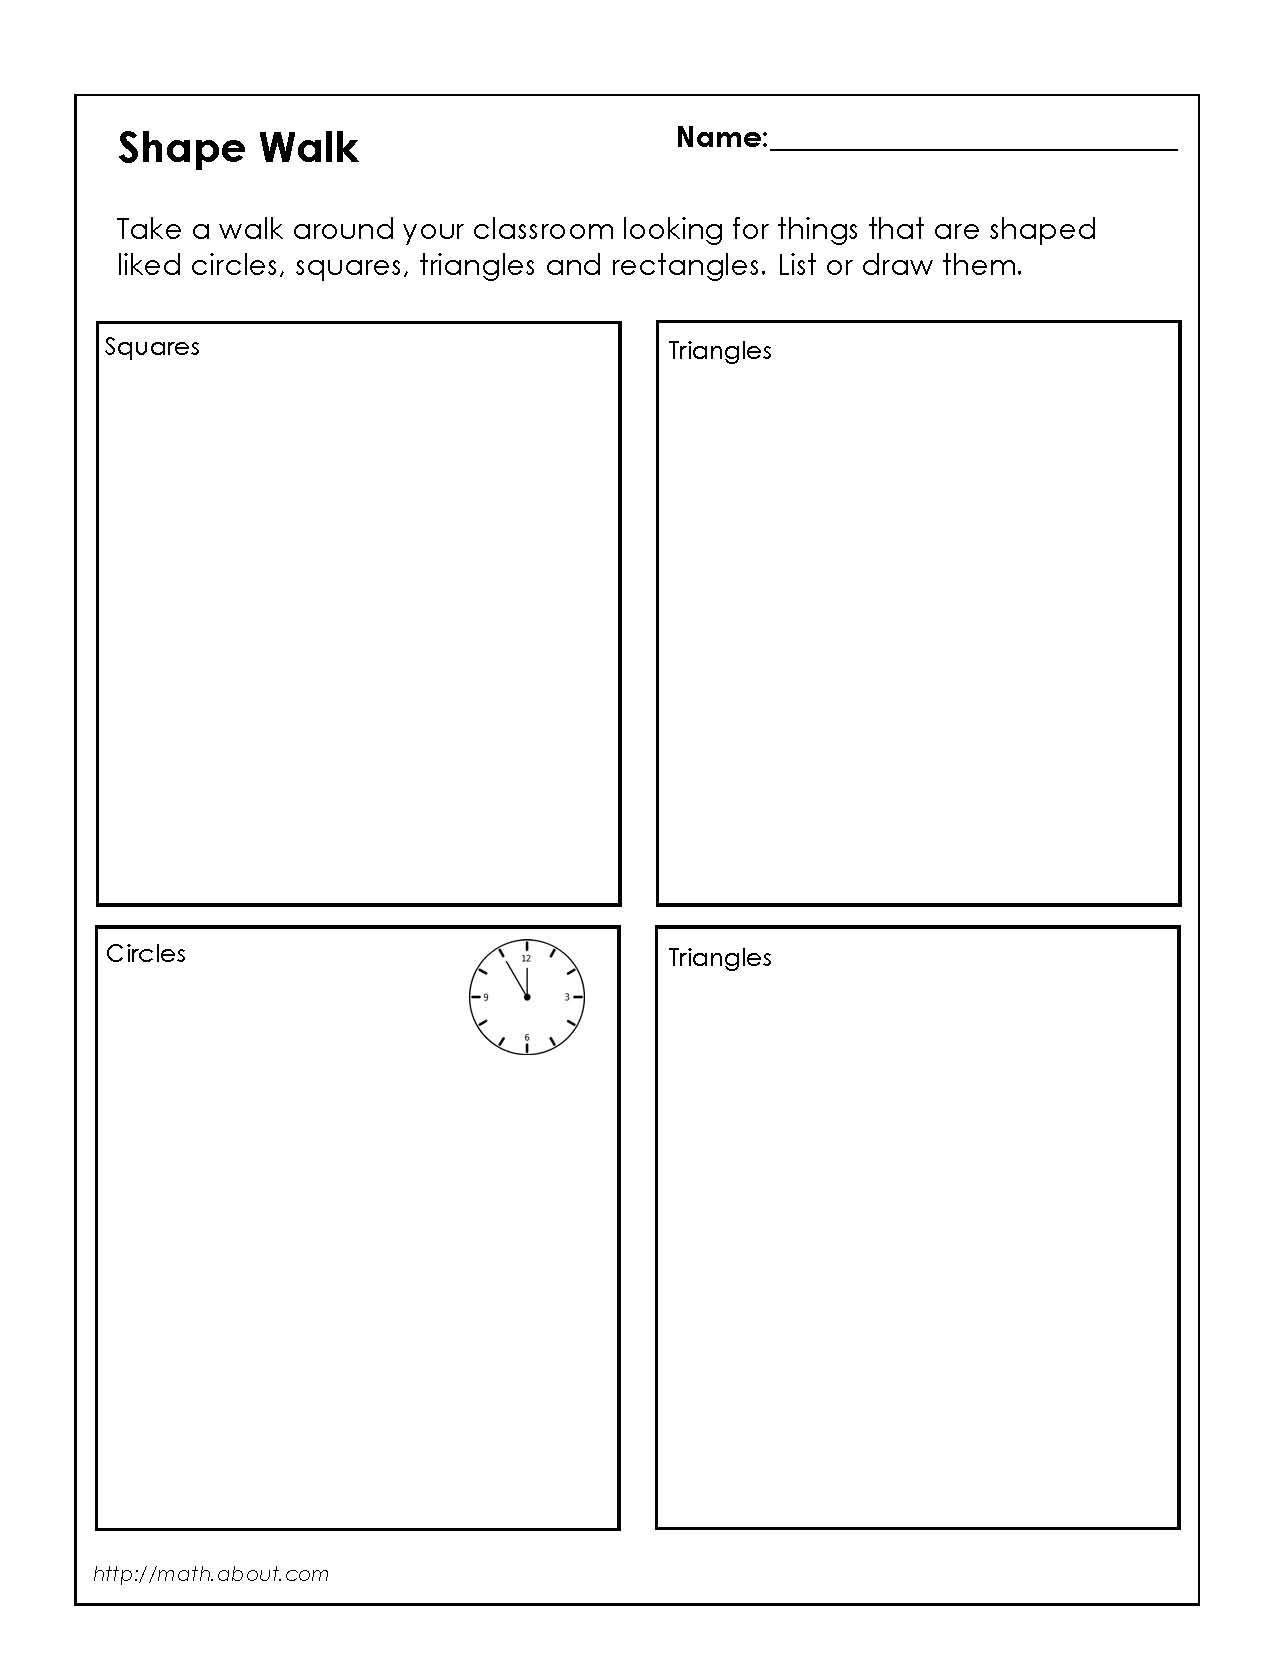 Uncategorized Math.about.com Worksheets downloadable geometry worksheets for 1st graders math graders